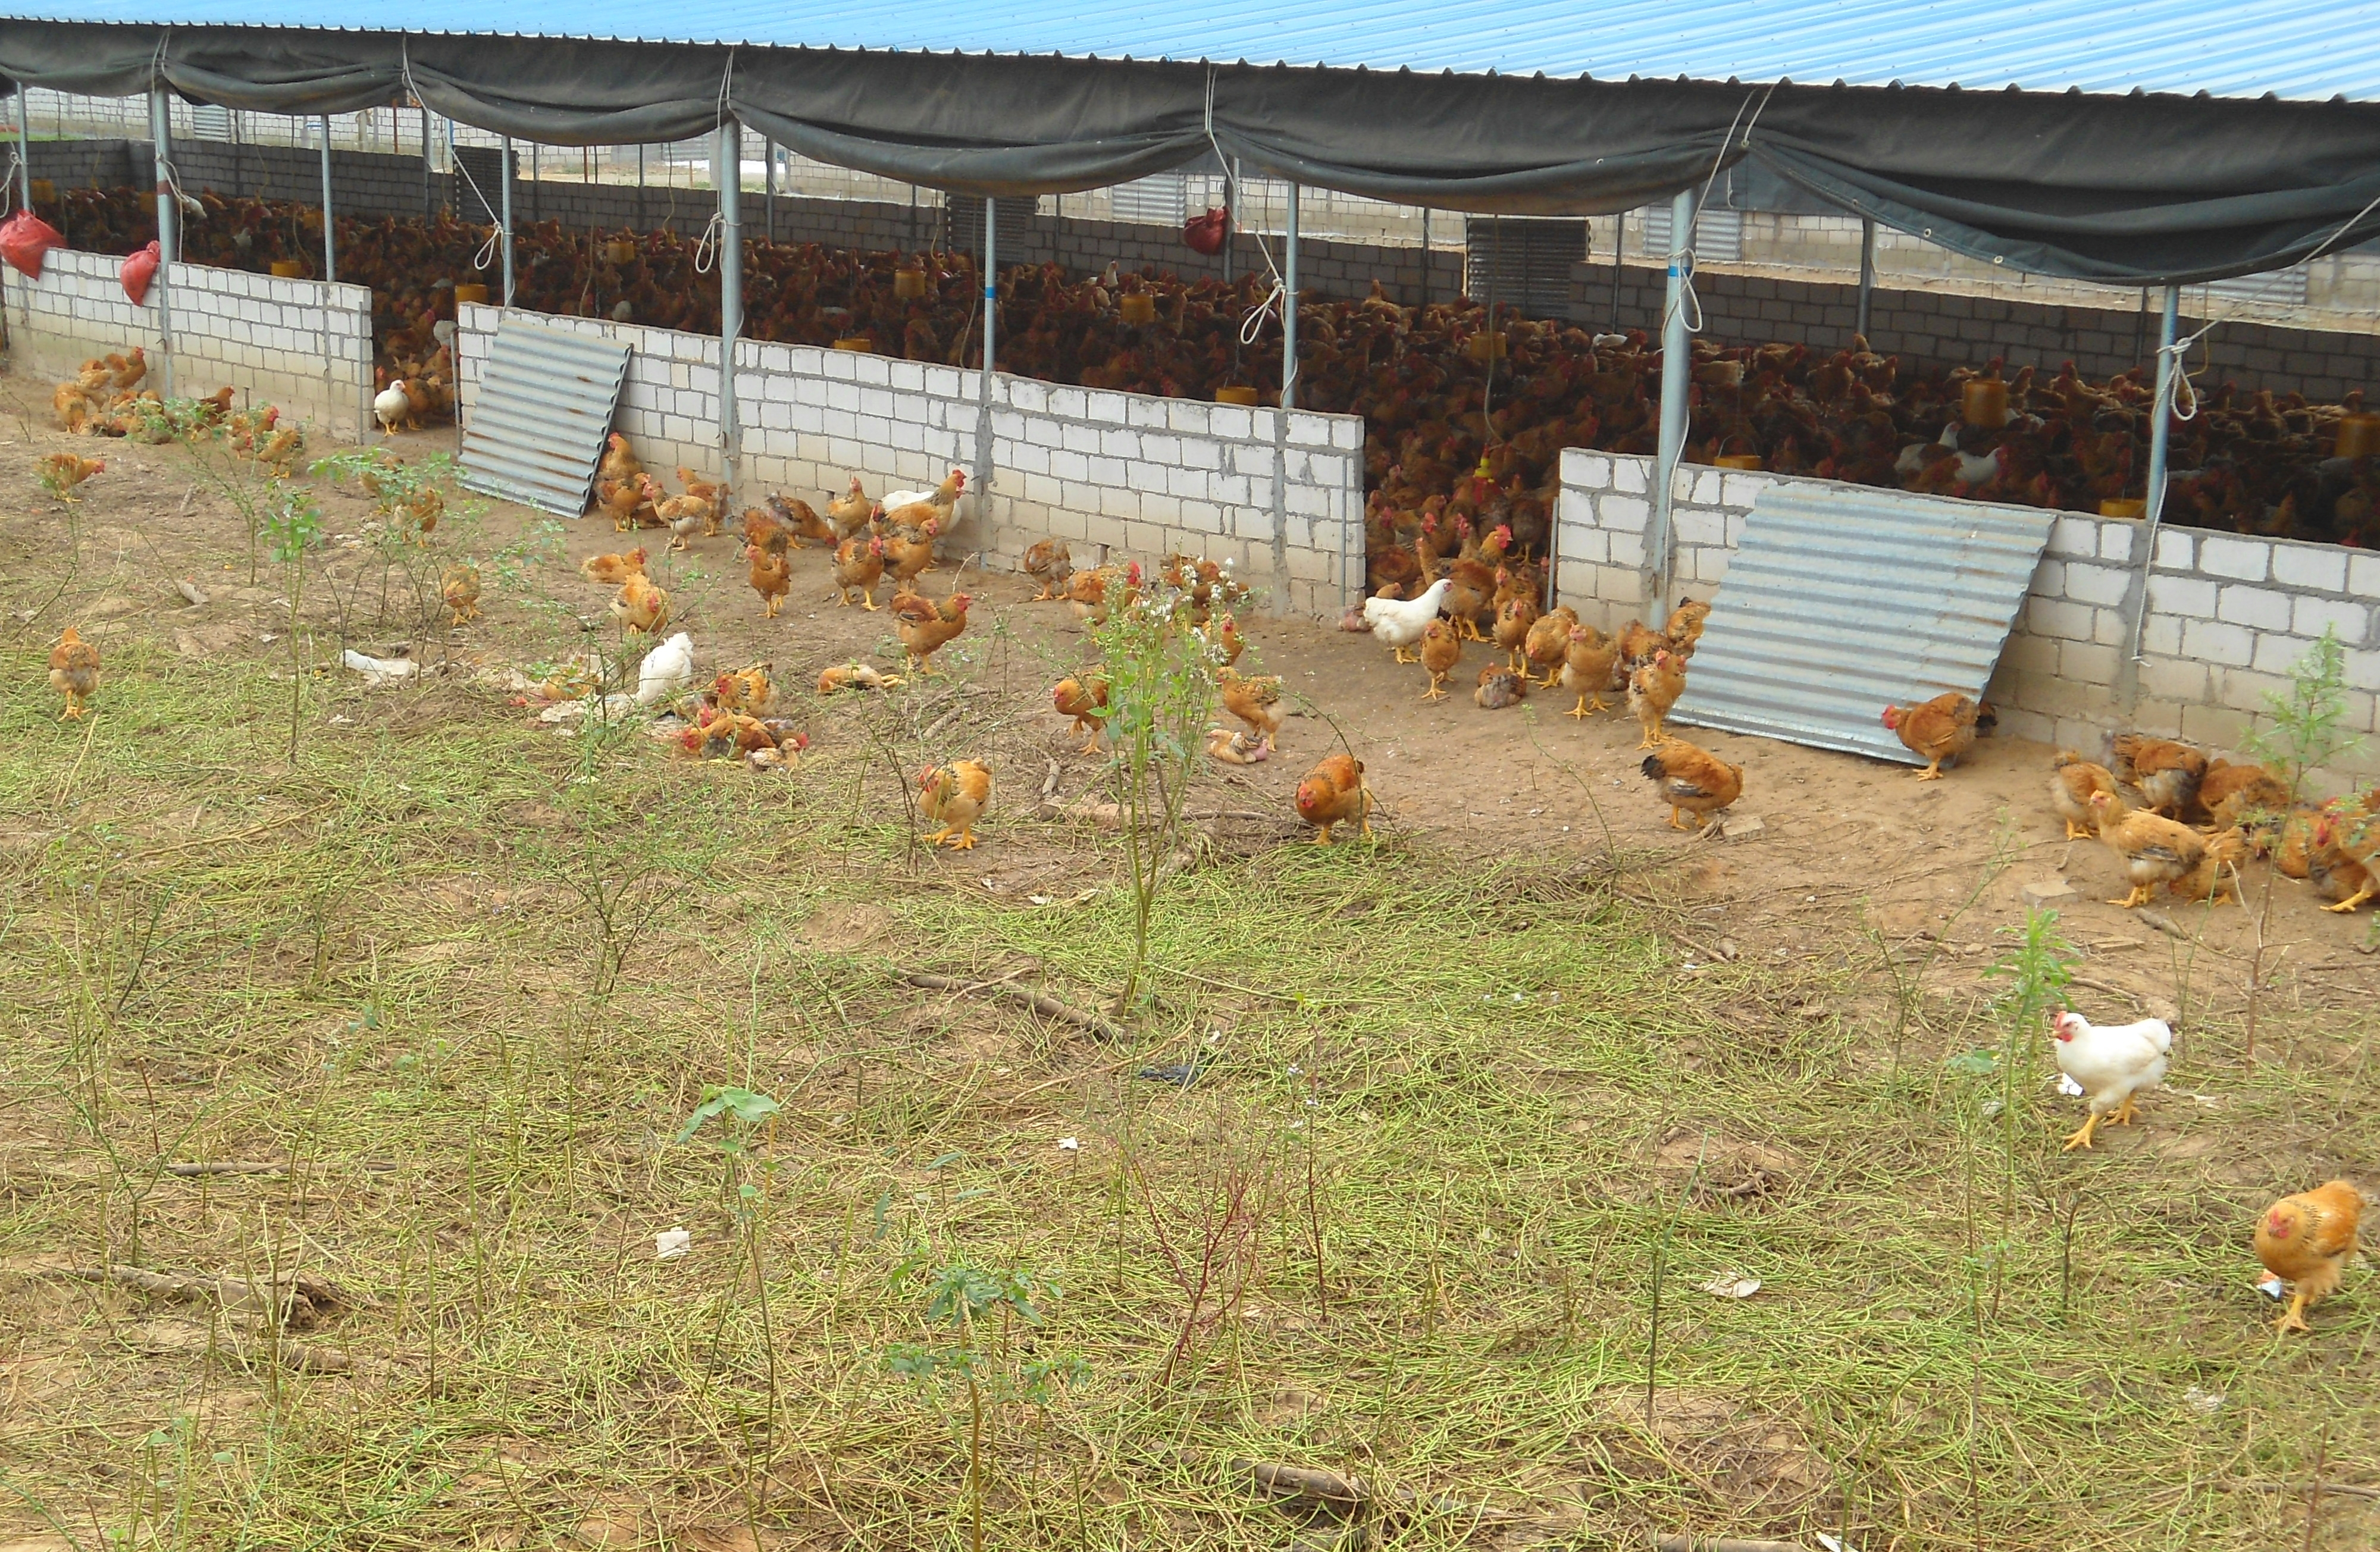 Hen S Chicken Coop Size For 20 Chickens